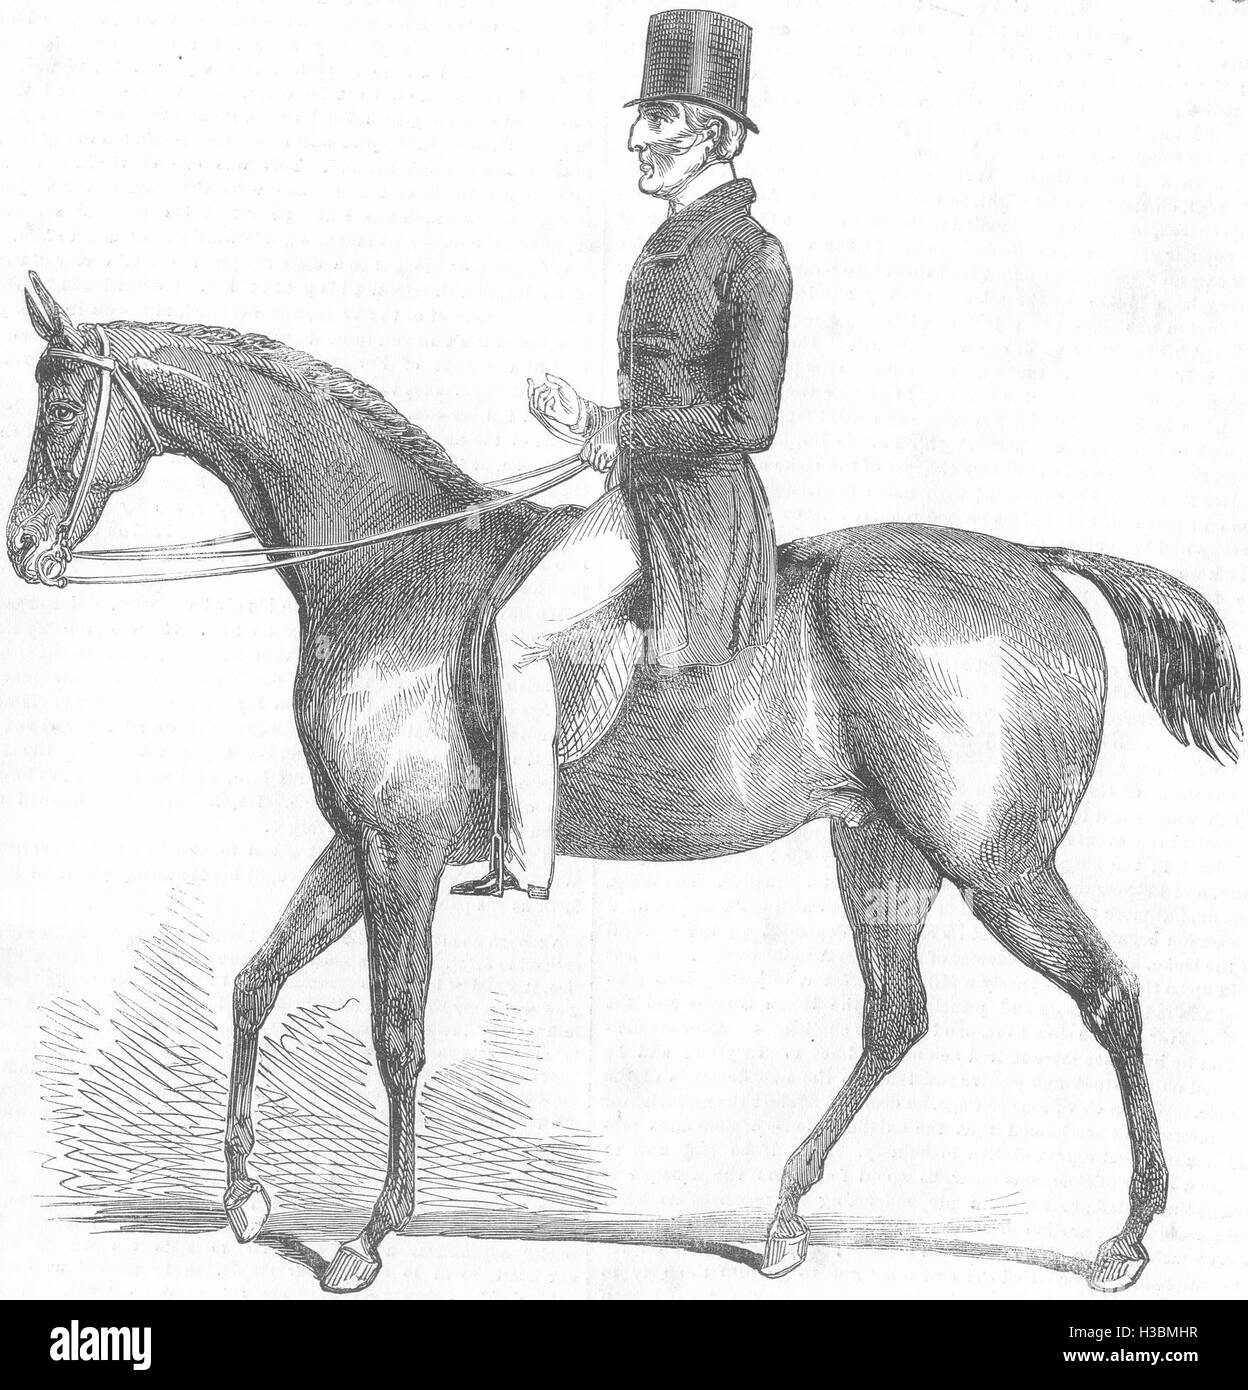 HORSES Wellington 1852. The Illustrated London News - Stock Image